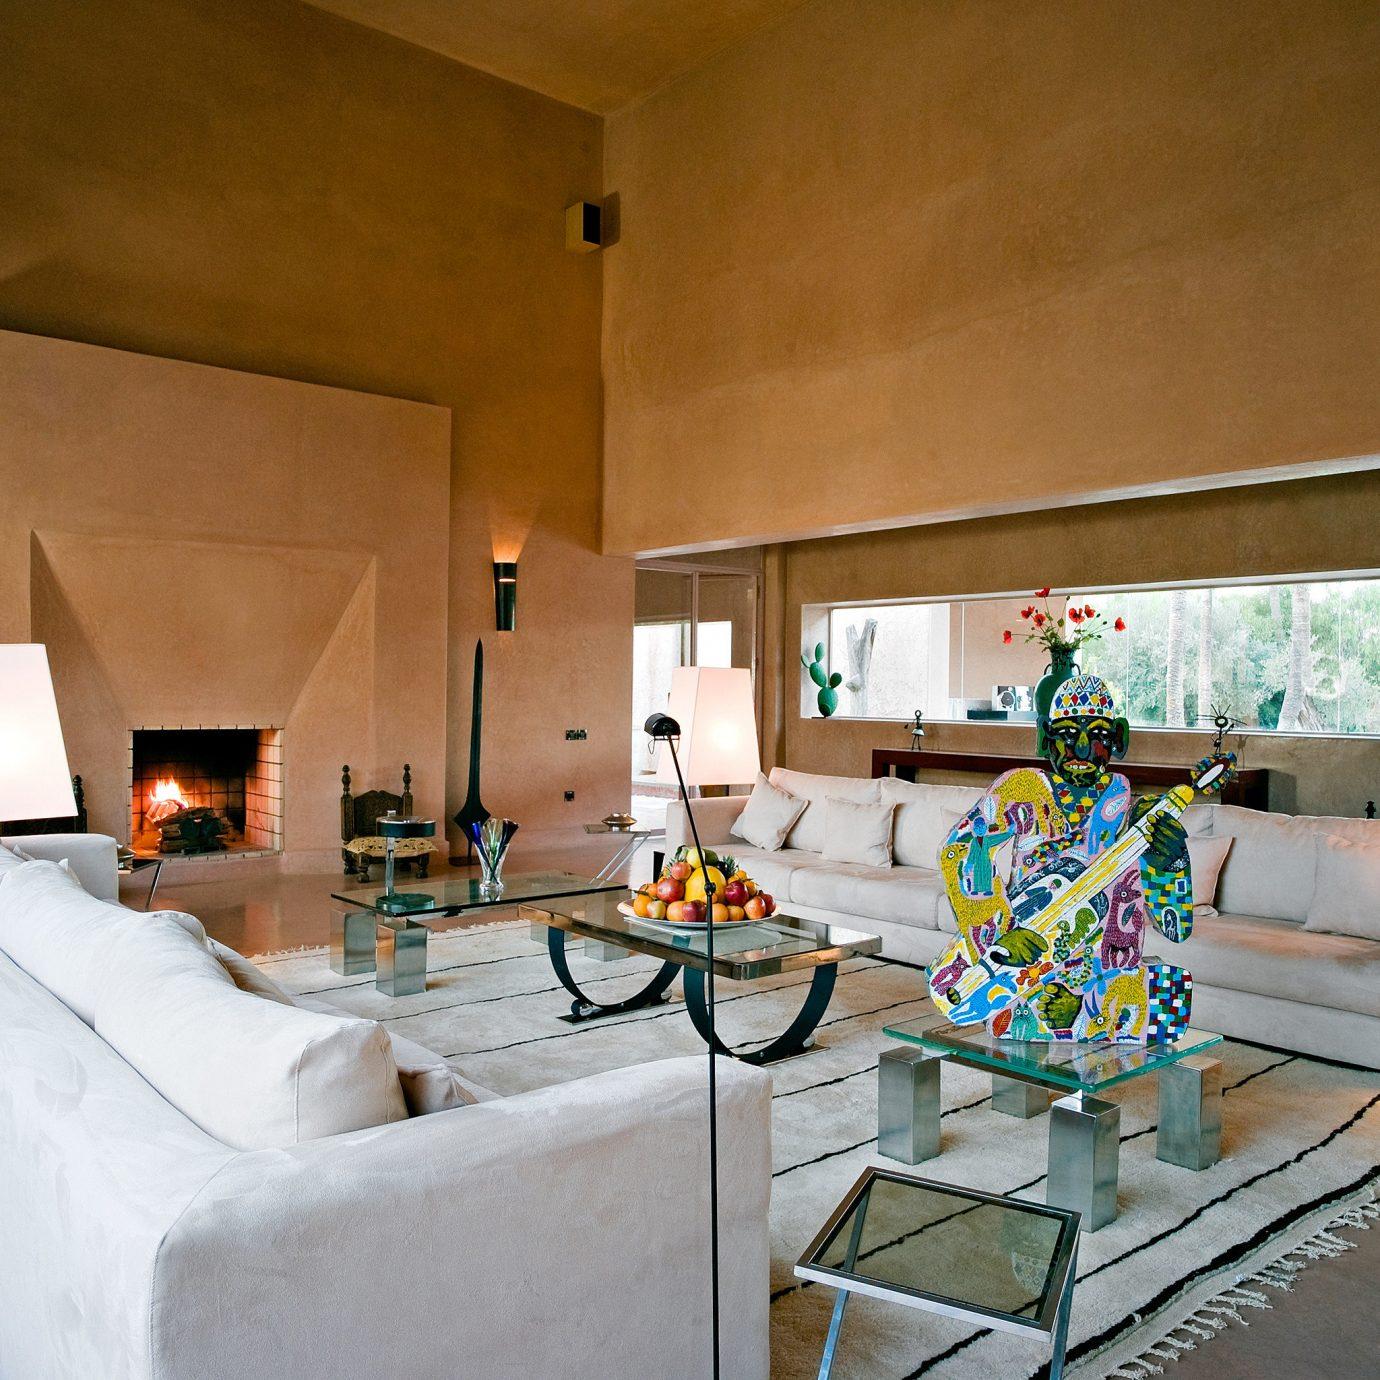 Family Suite property house home living room Villa restaurant